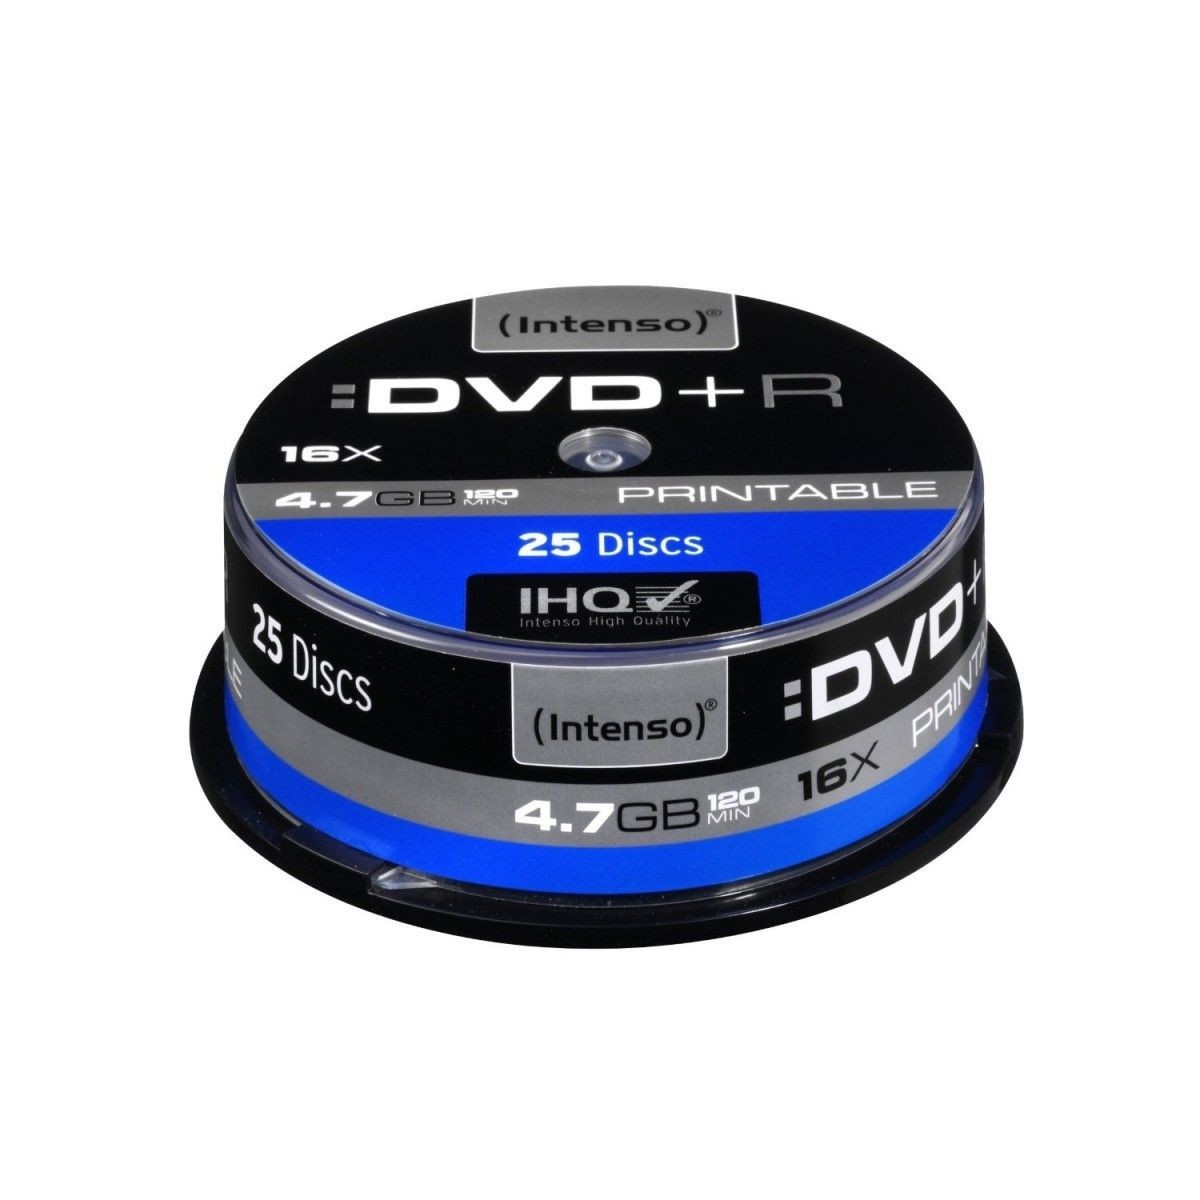 Intenso DVD-R 4.7GB 16x Printable Extra Fine Matt Fullface (cake box, 25szt)